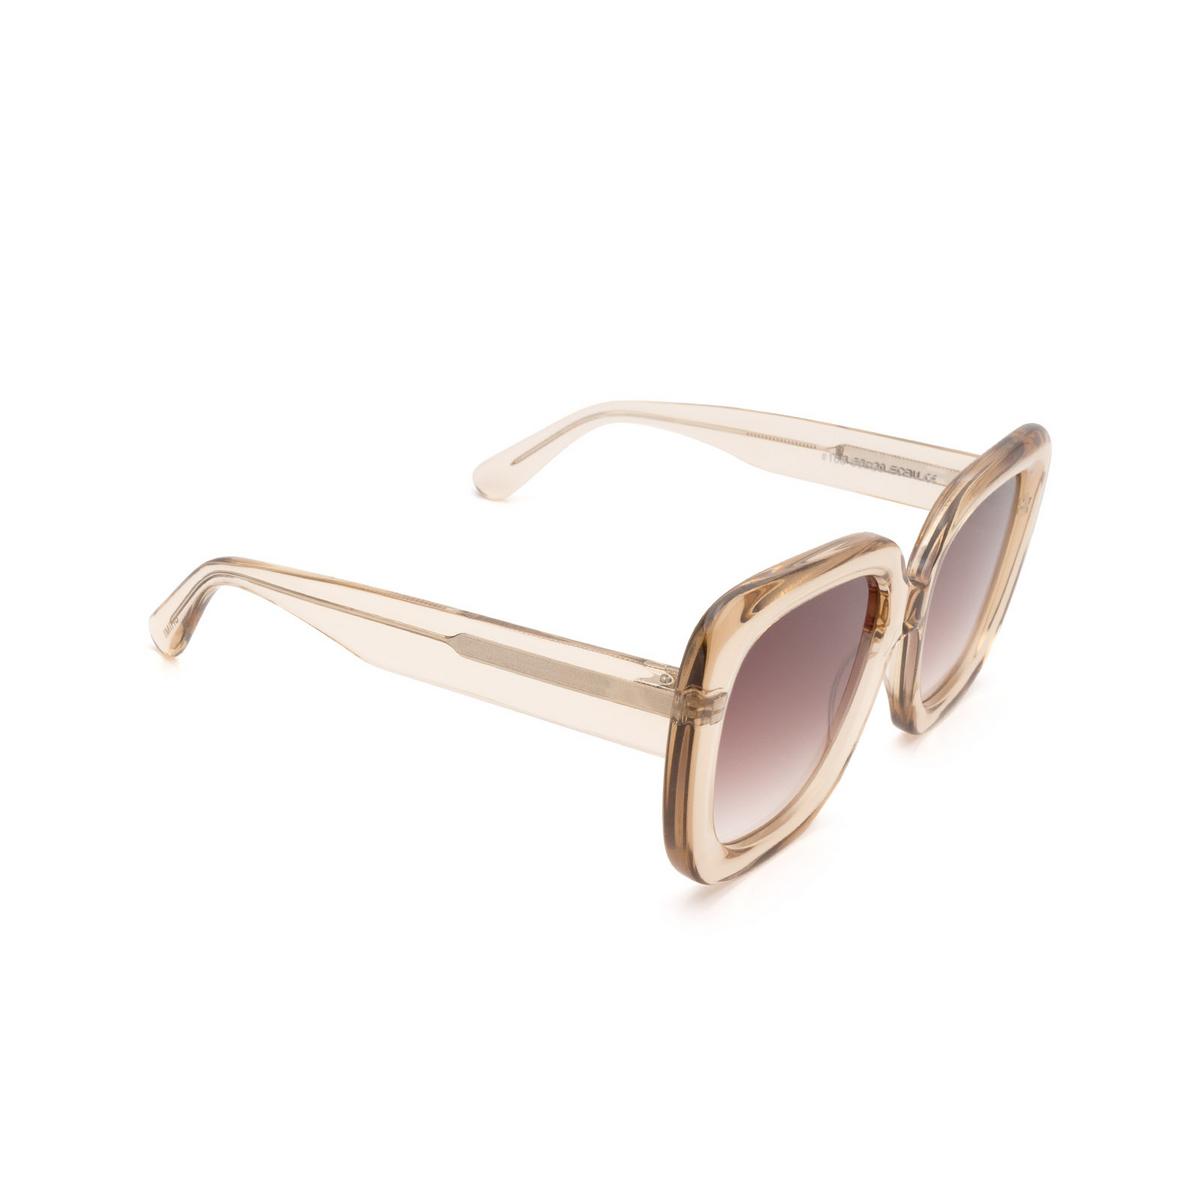 Chimi® Square Sunglasses: #108 color Light Beige Ecru - three-quarters view.